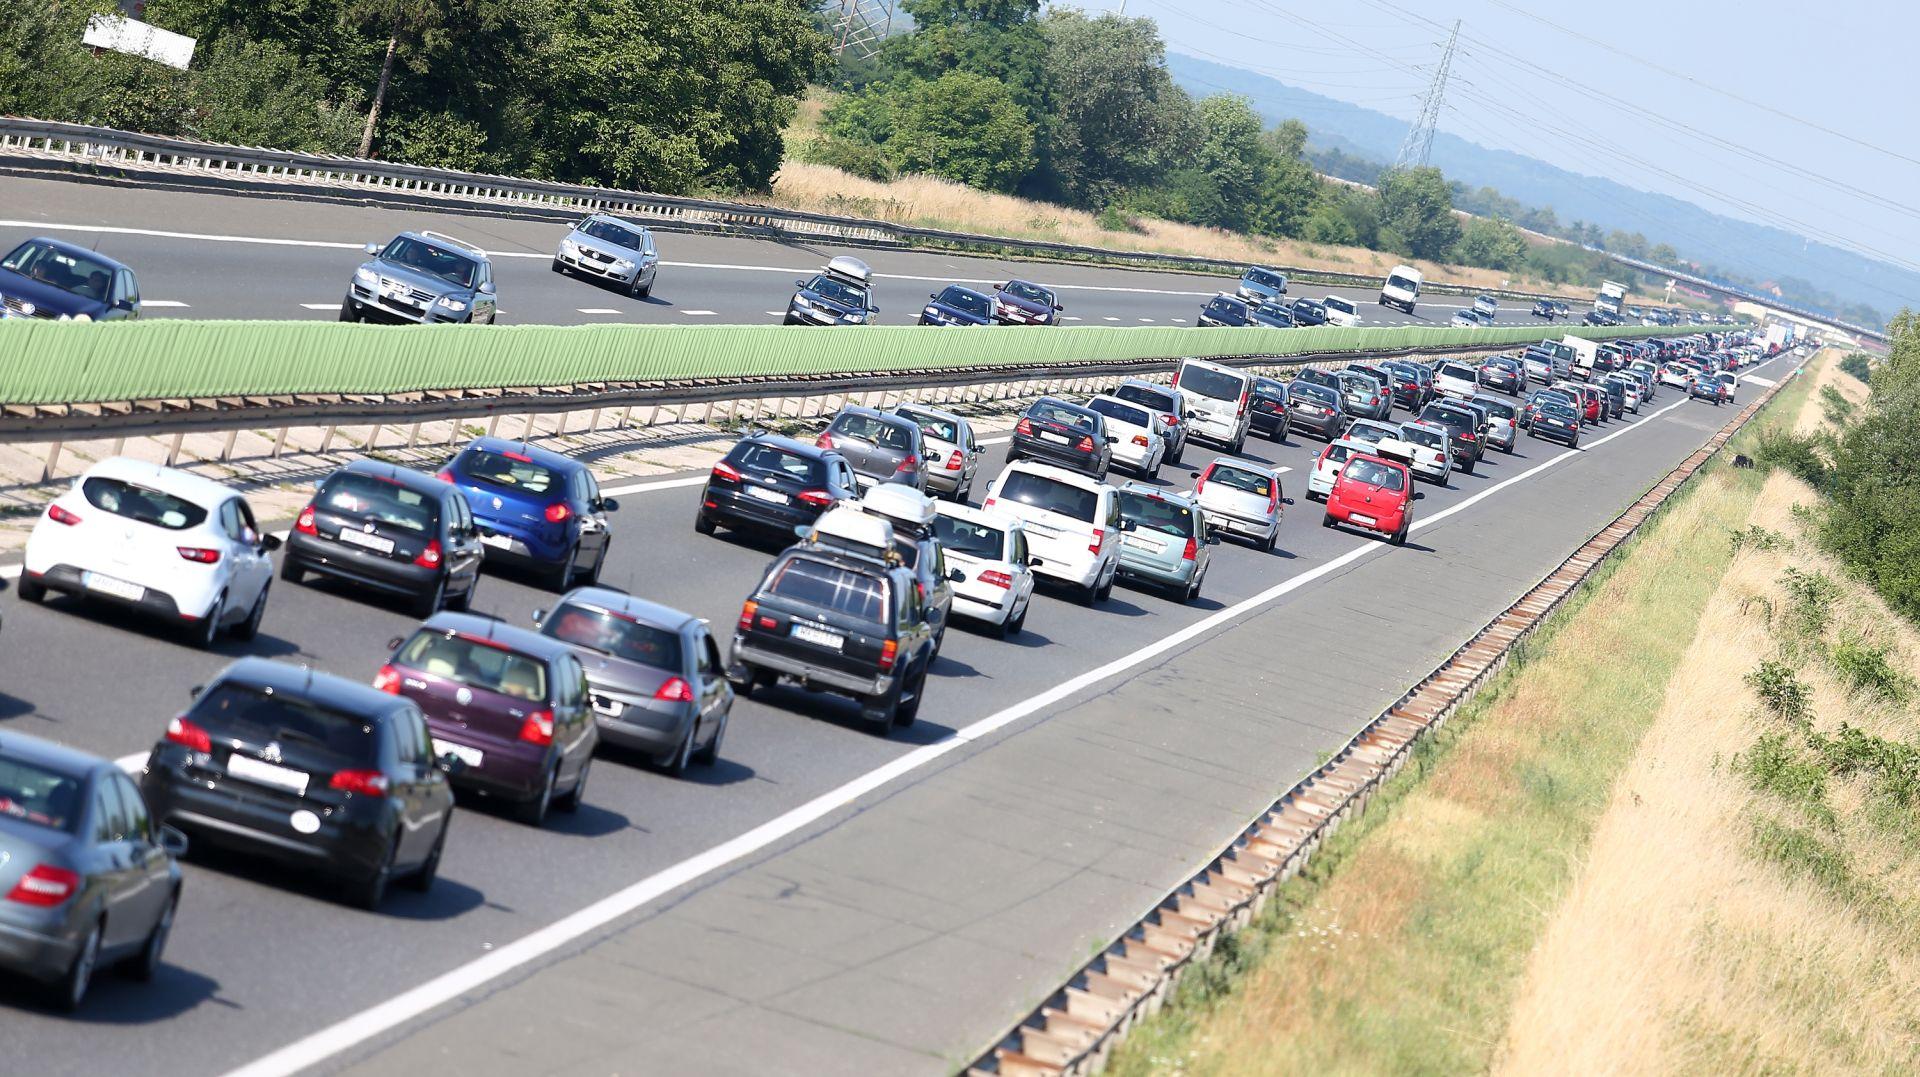 HAK Promet srednje gust, jak vjetar na A6, prometna nesreća na A3